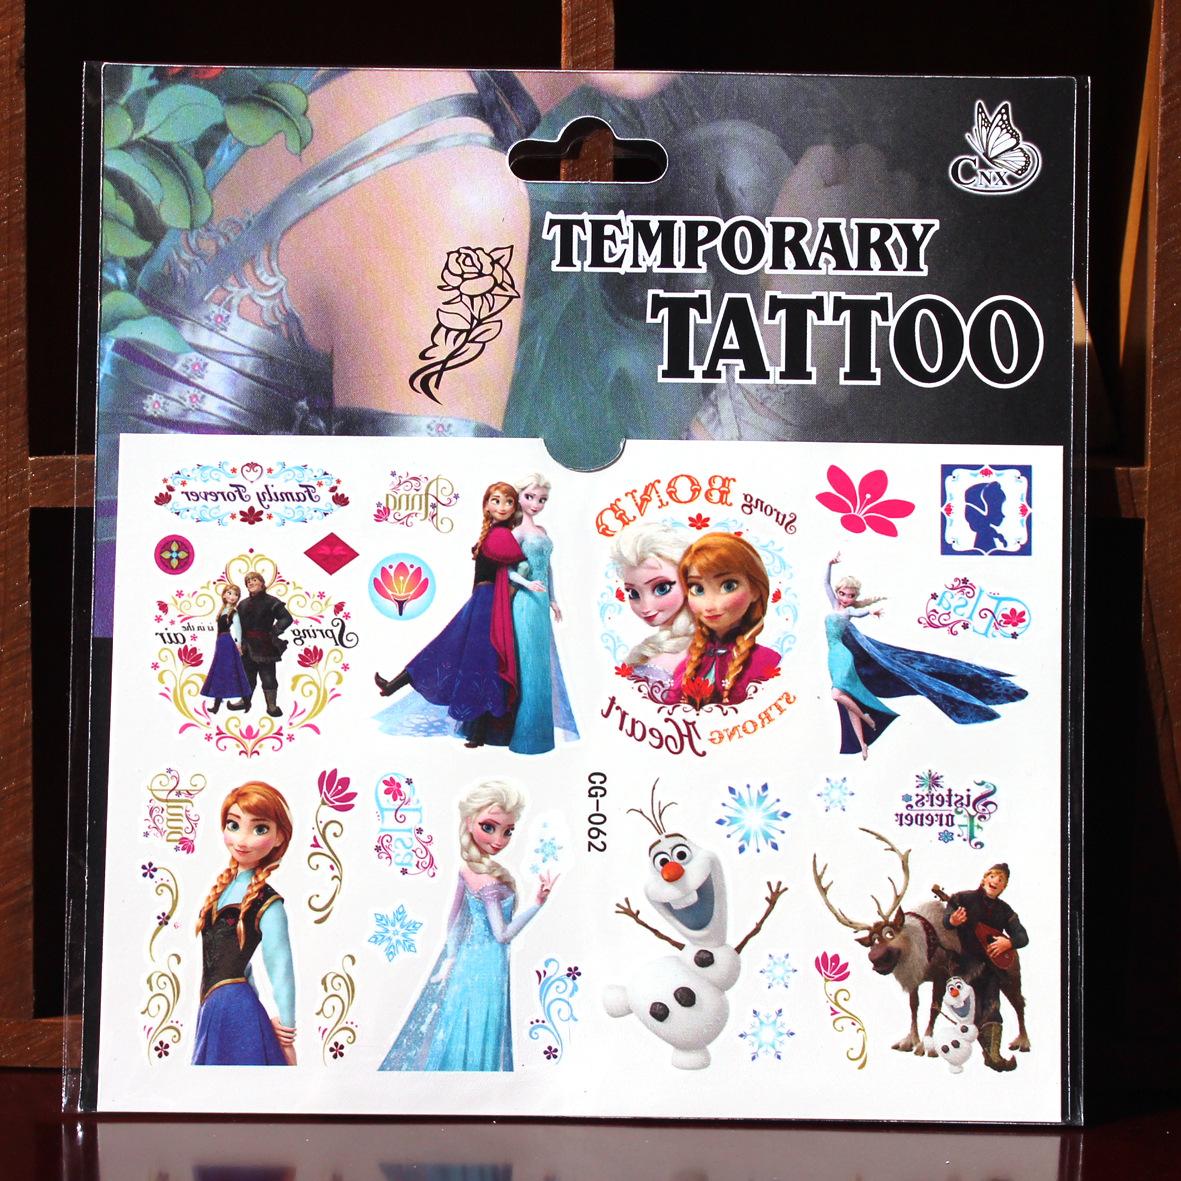 2016 New Children Cartoon Temporary Tattoo Stickers Crystal Transfer Waterproof Brand Elsa Girls a Summer Free Shipping(China (Mainland))